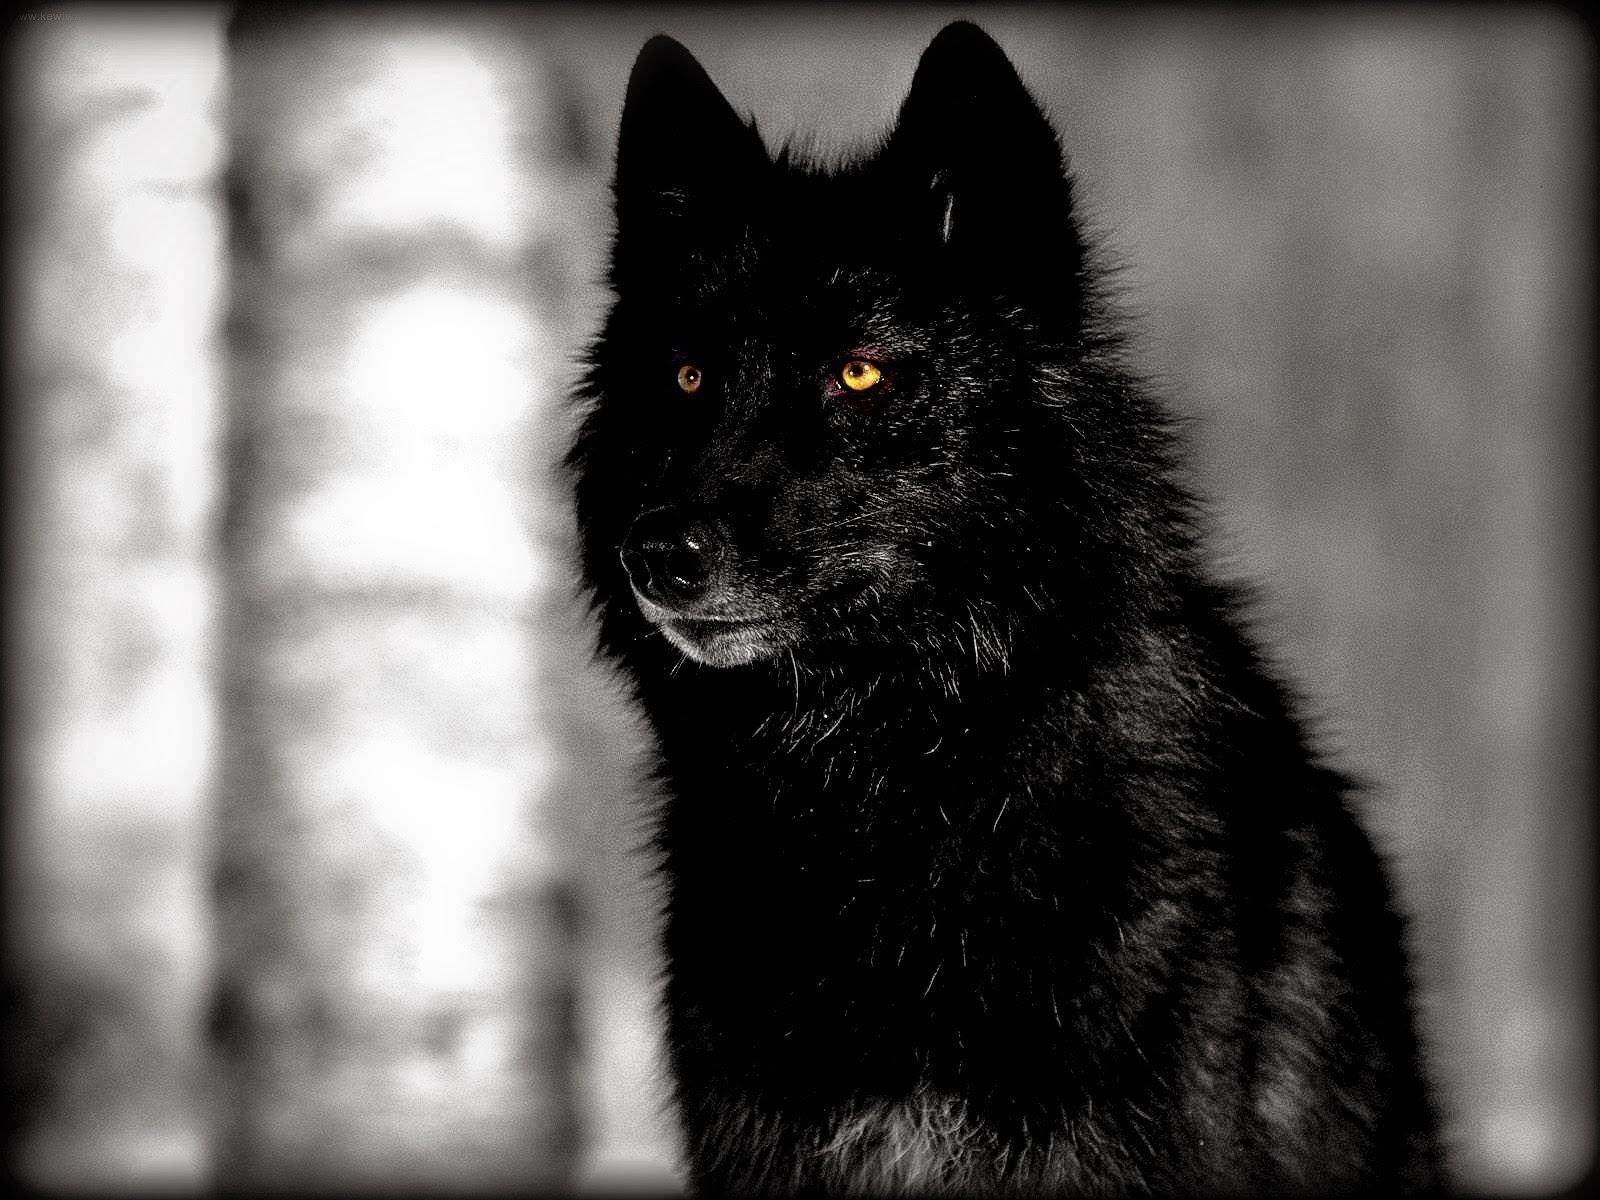 White Wolf : Stunning Photographs Showcase The Beauty Of